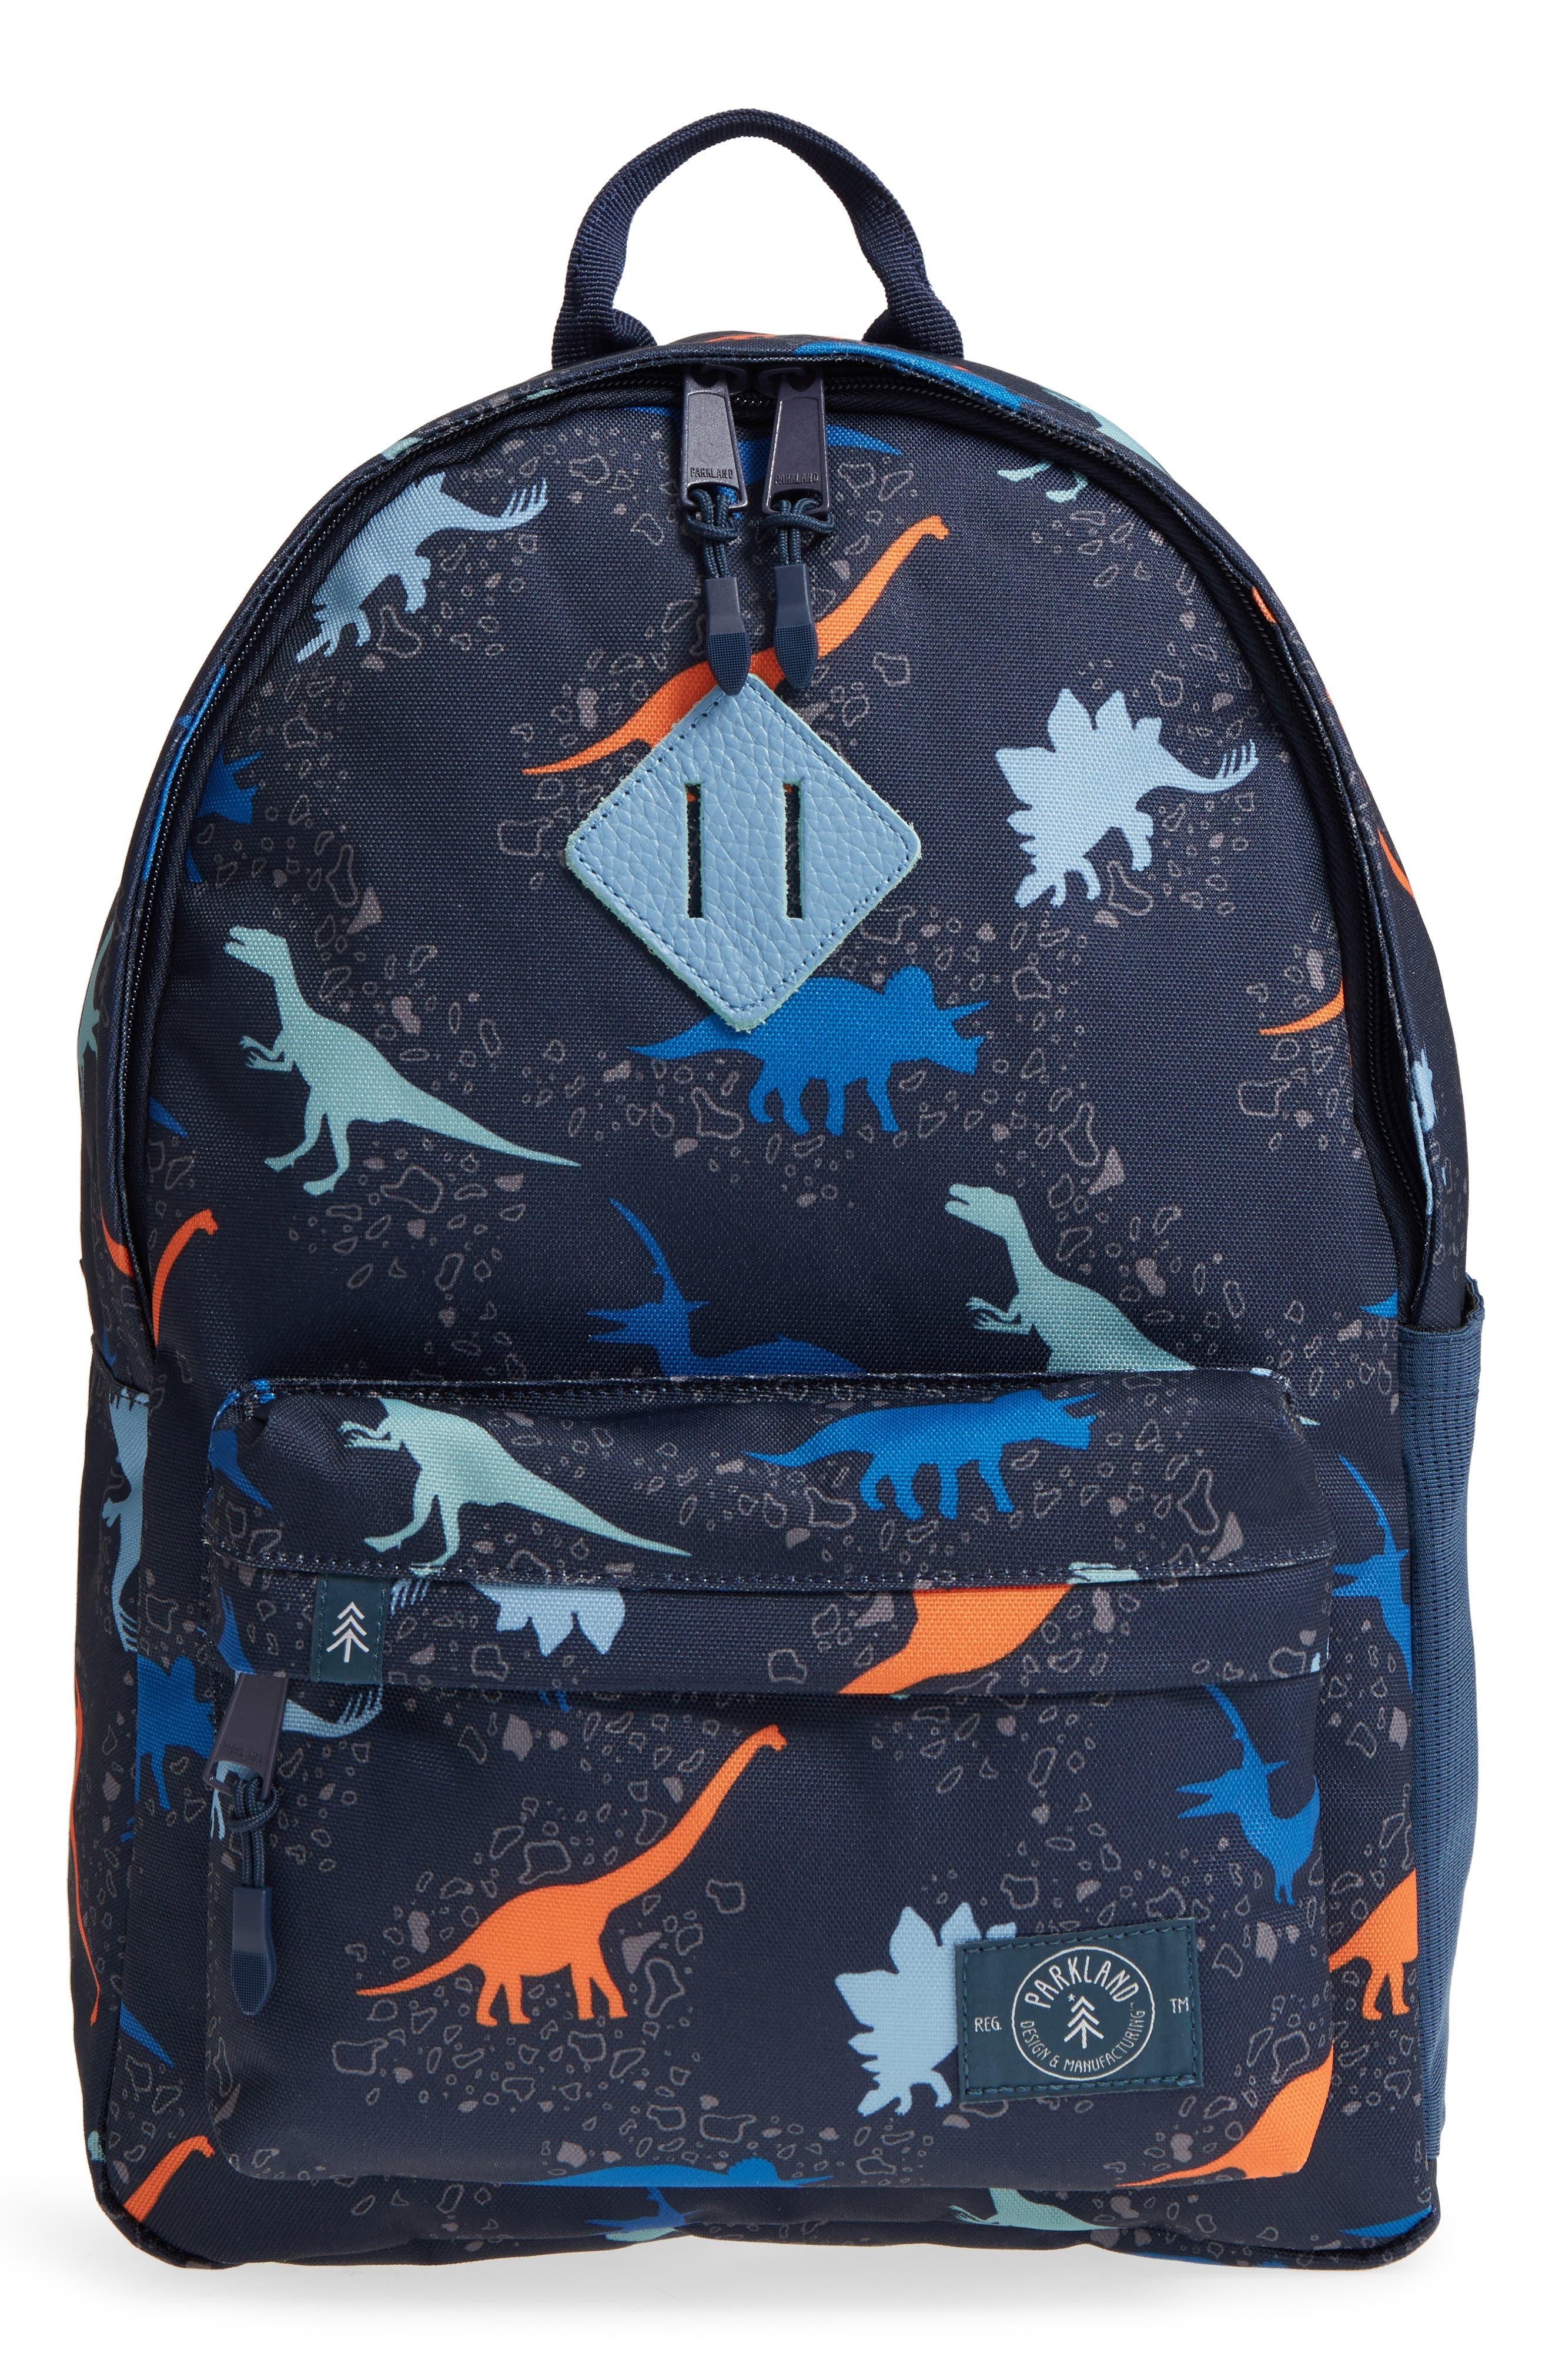 Bayside Print Backpack,                         Main,                         color,